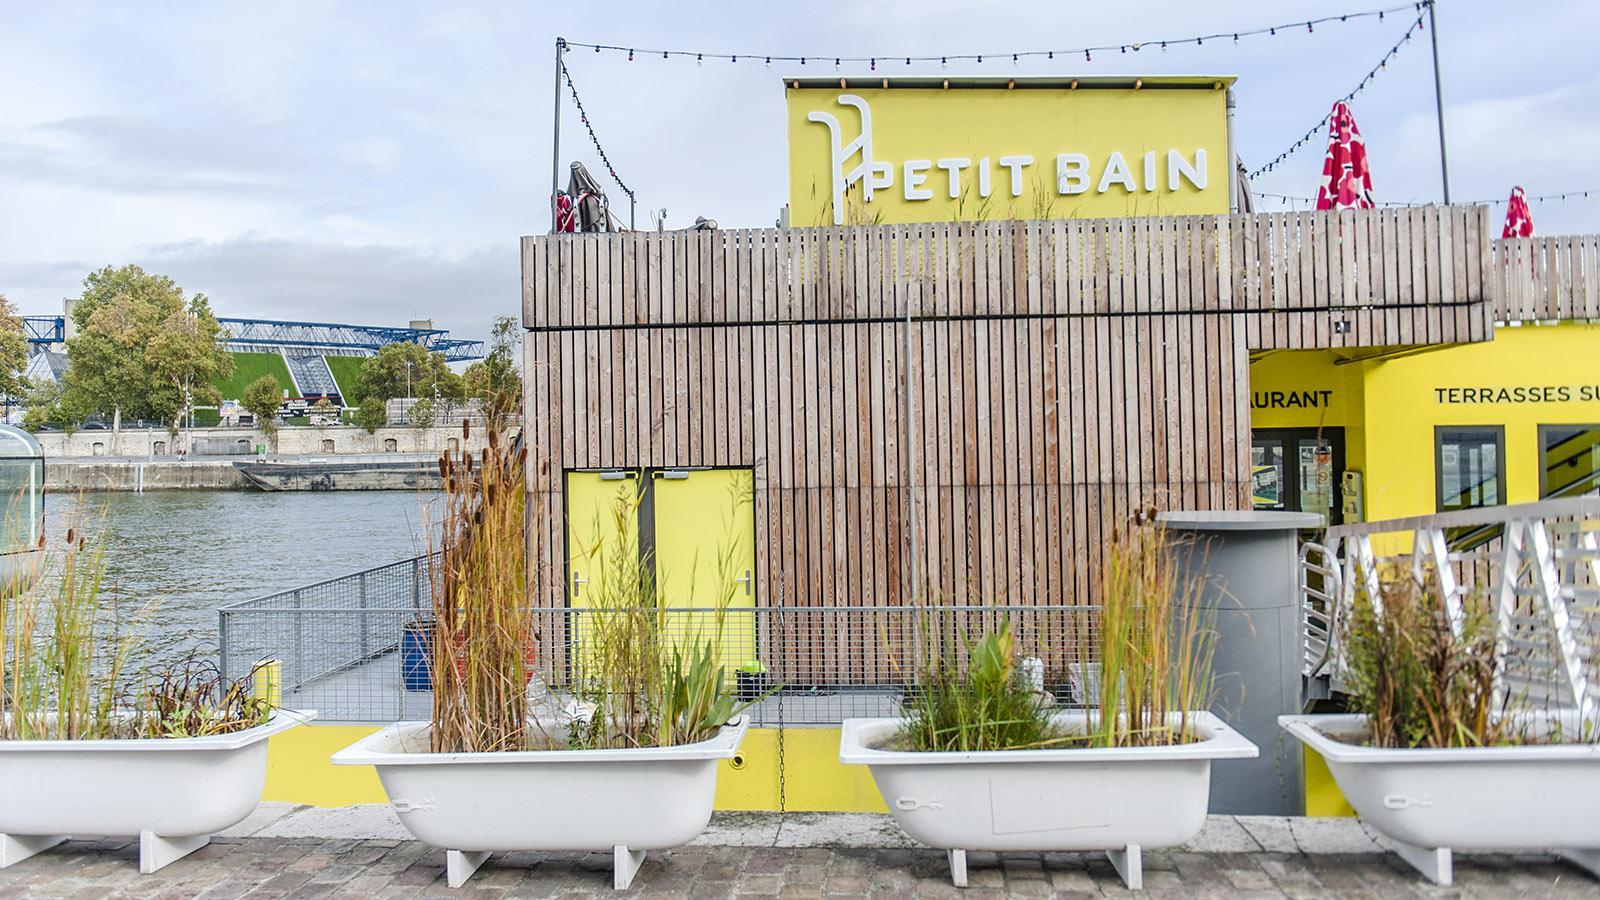 Tolbiac: Le Petit Bain - ein beliebte Bar im Sommer. Foto: Hilke Maunder